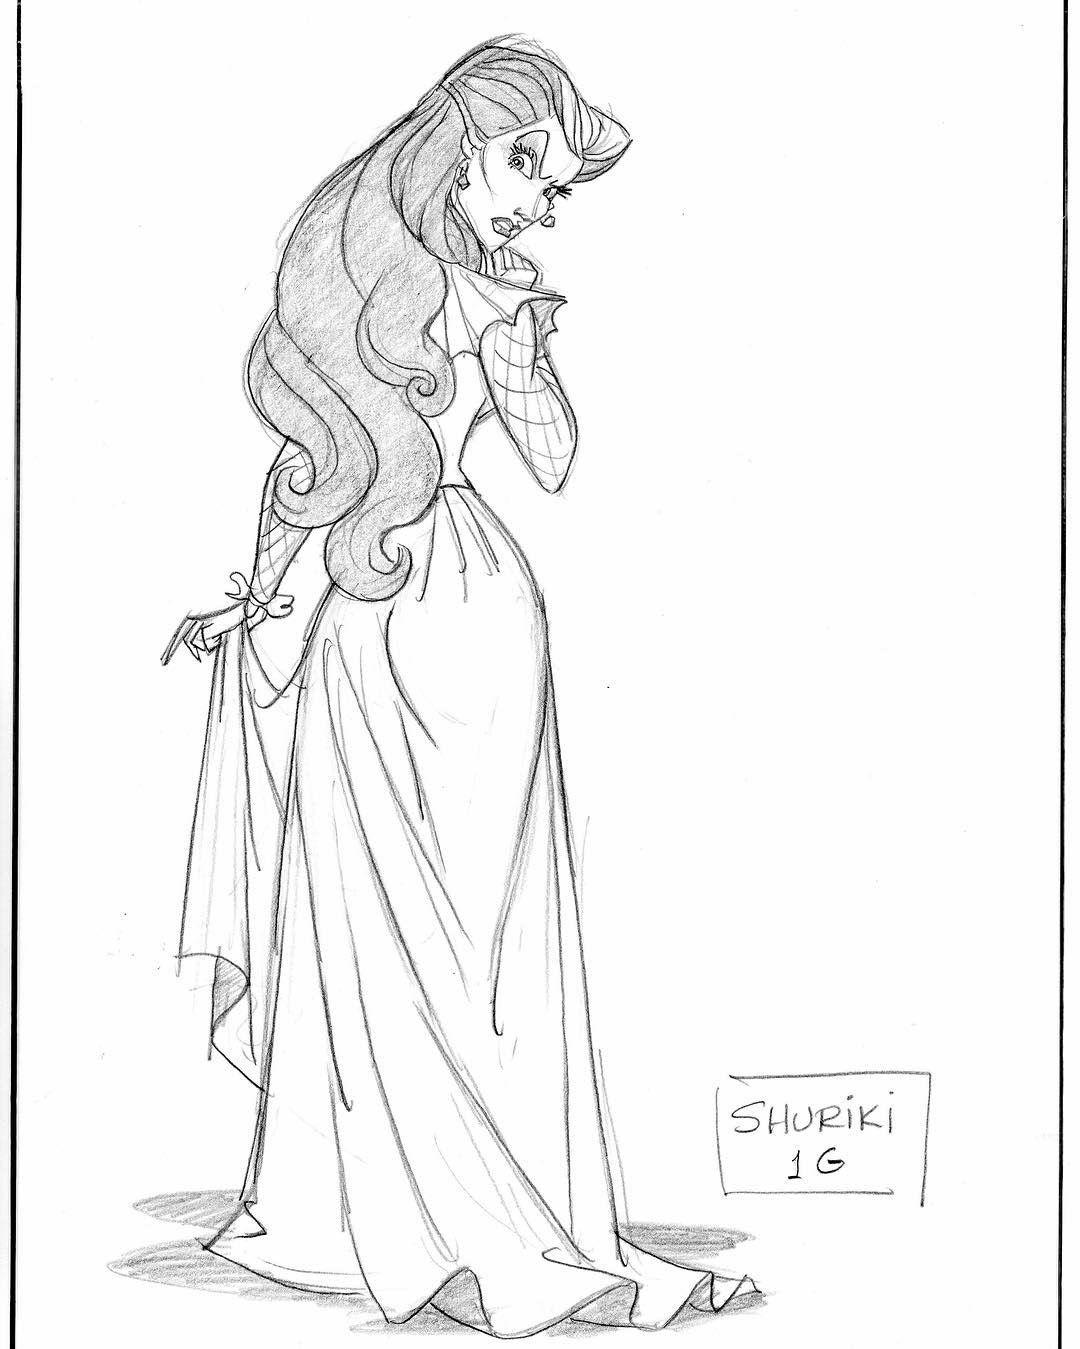 Pin By Aurora Silverthorne On Shuriki Disney Elena Princess Elena Cartoon [ jpg ]